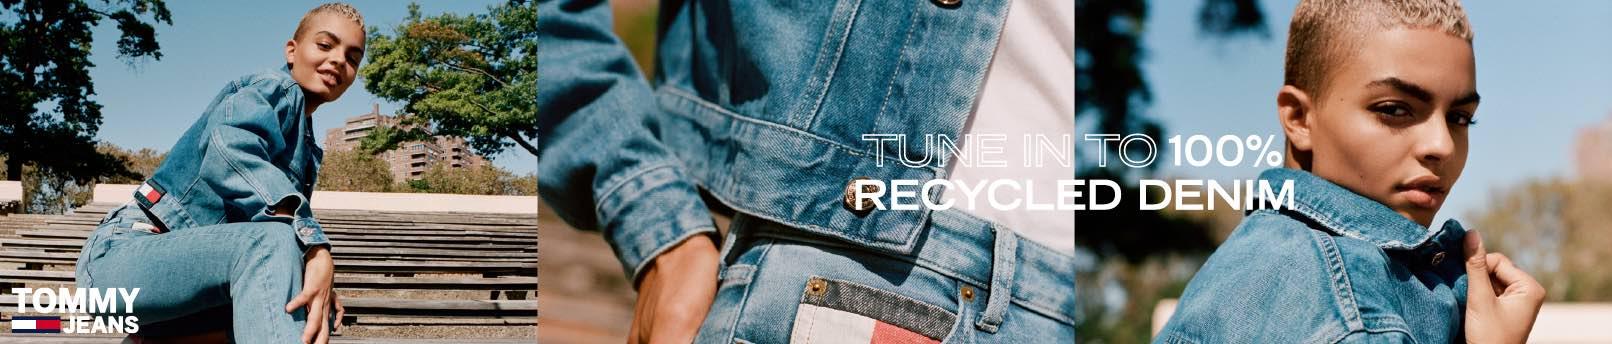 Shop Tommy Jeans